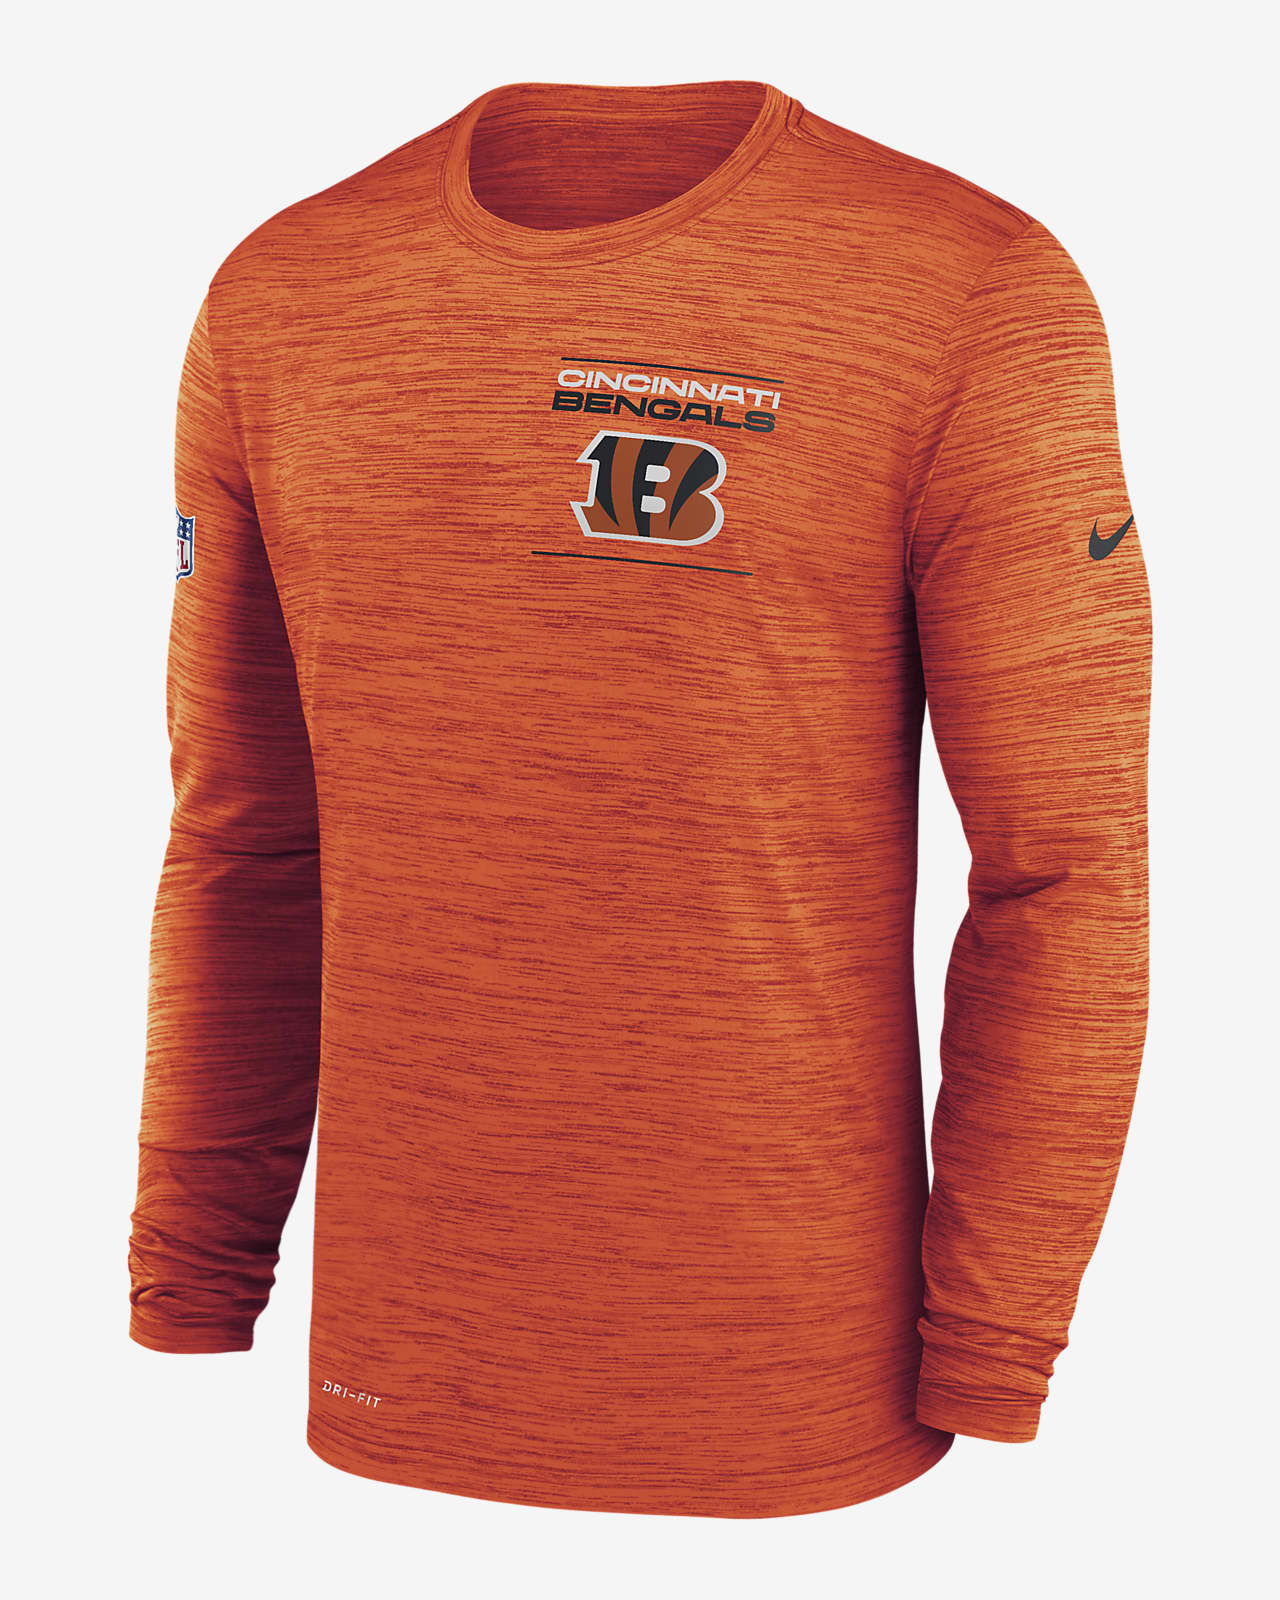 Nike Dri-FIT Sideline Velocity Legend (NFL Cincinnati Bengals) Men's Long-Sleeve T-Shirt